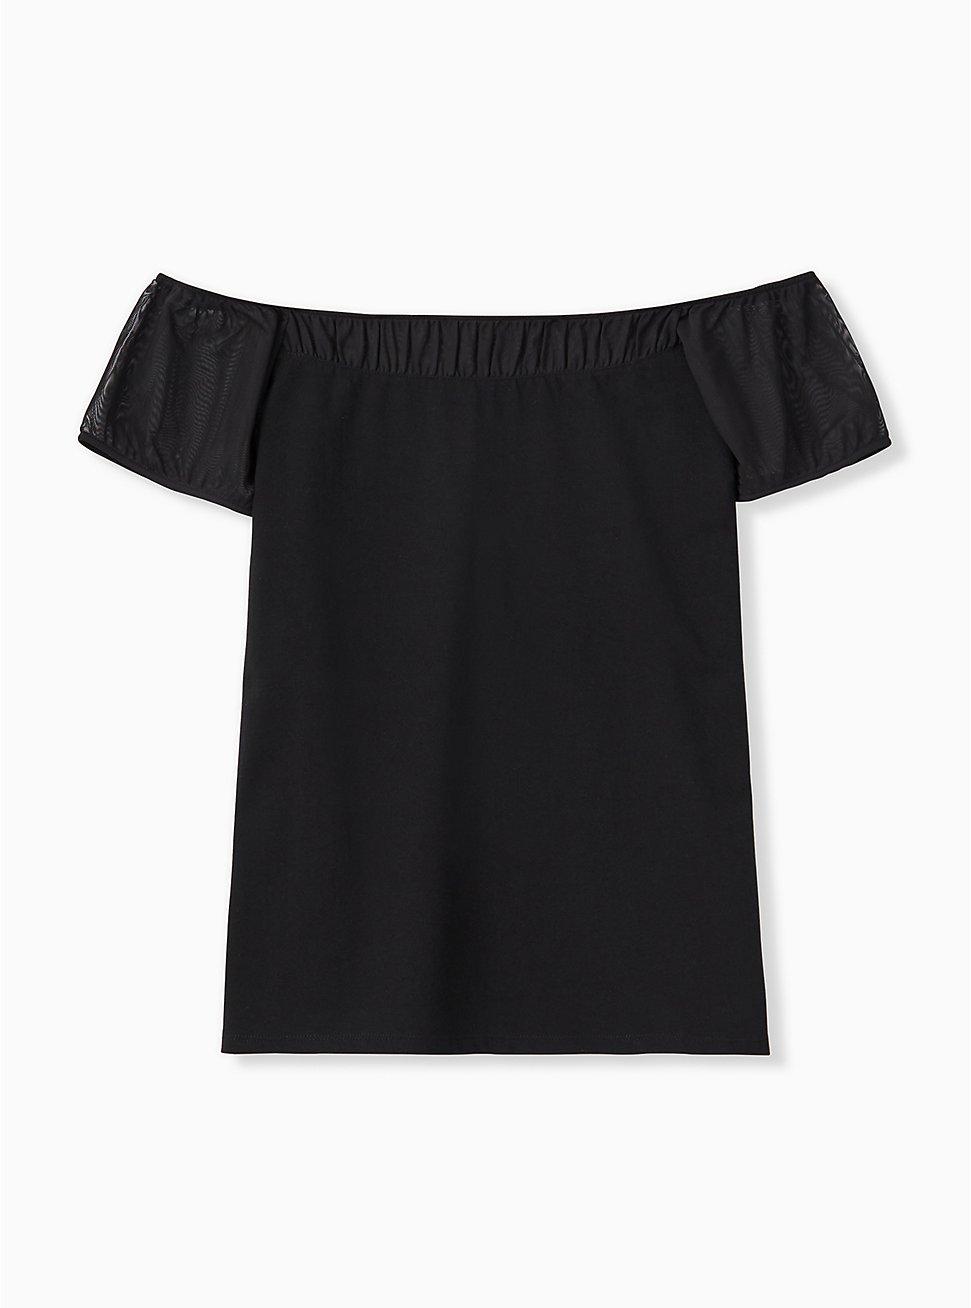 Plus Size Black Off Shoulder Foxy Tee, DEEP BLACK, hi-res